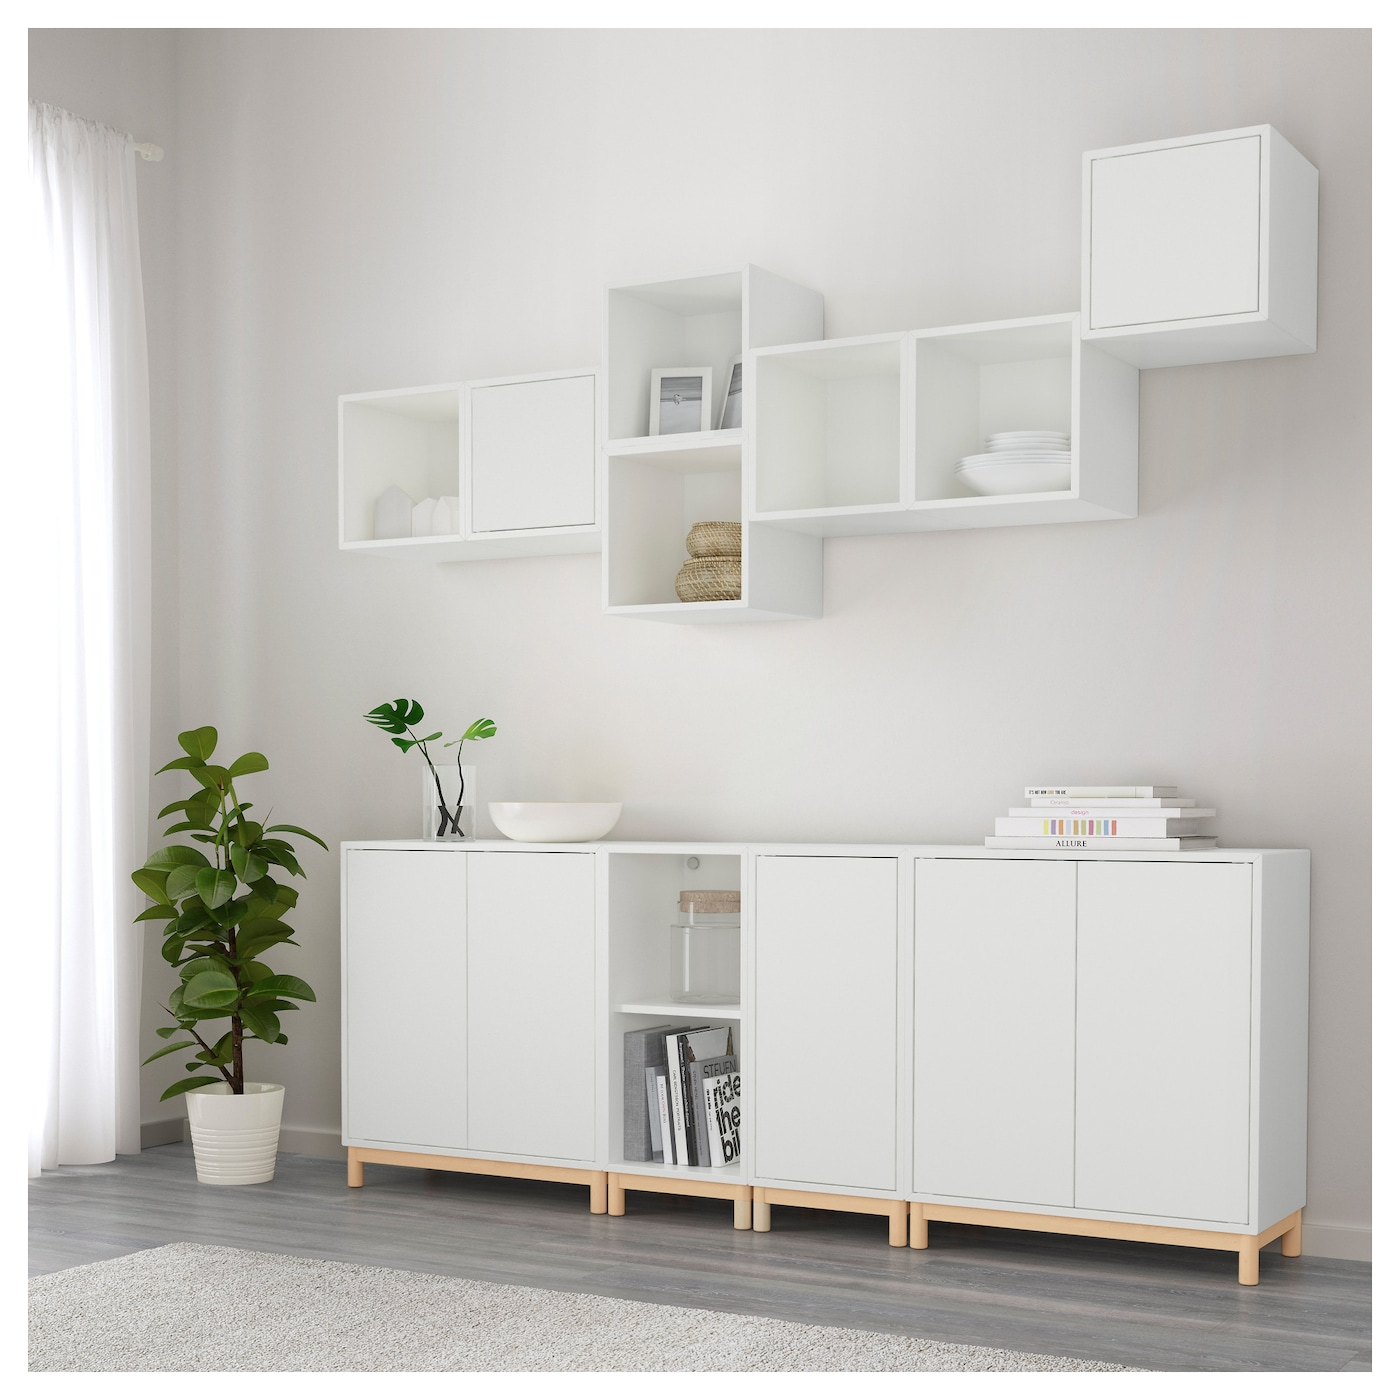 eket cabinet combination with legs white 210 x 35 x 210 cm ikea. Black Bedroom Furniture Sets. Home Design Ideas